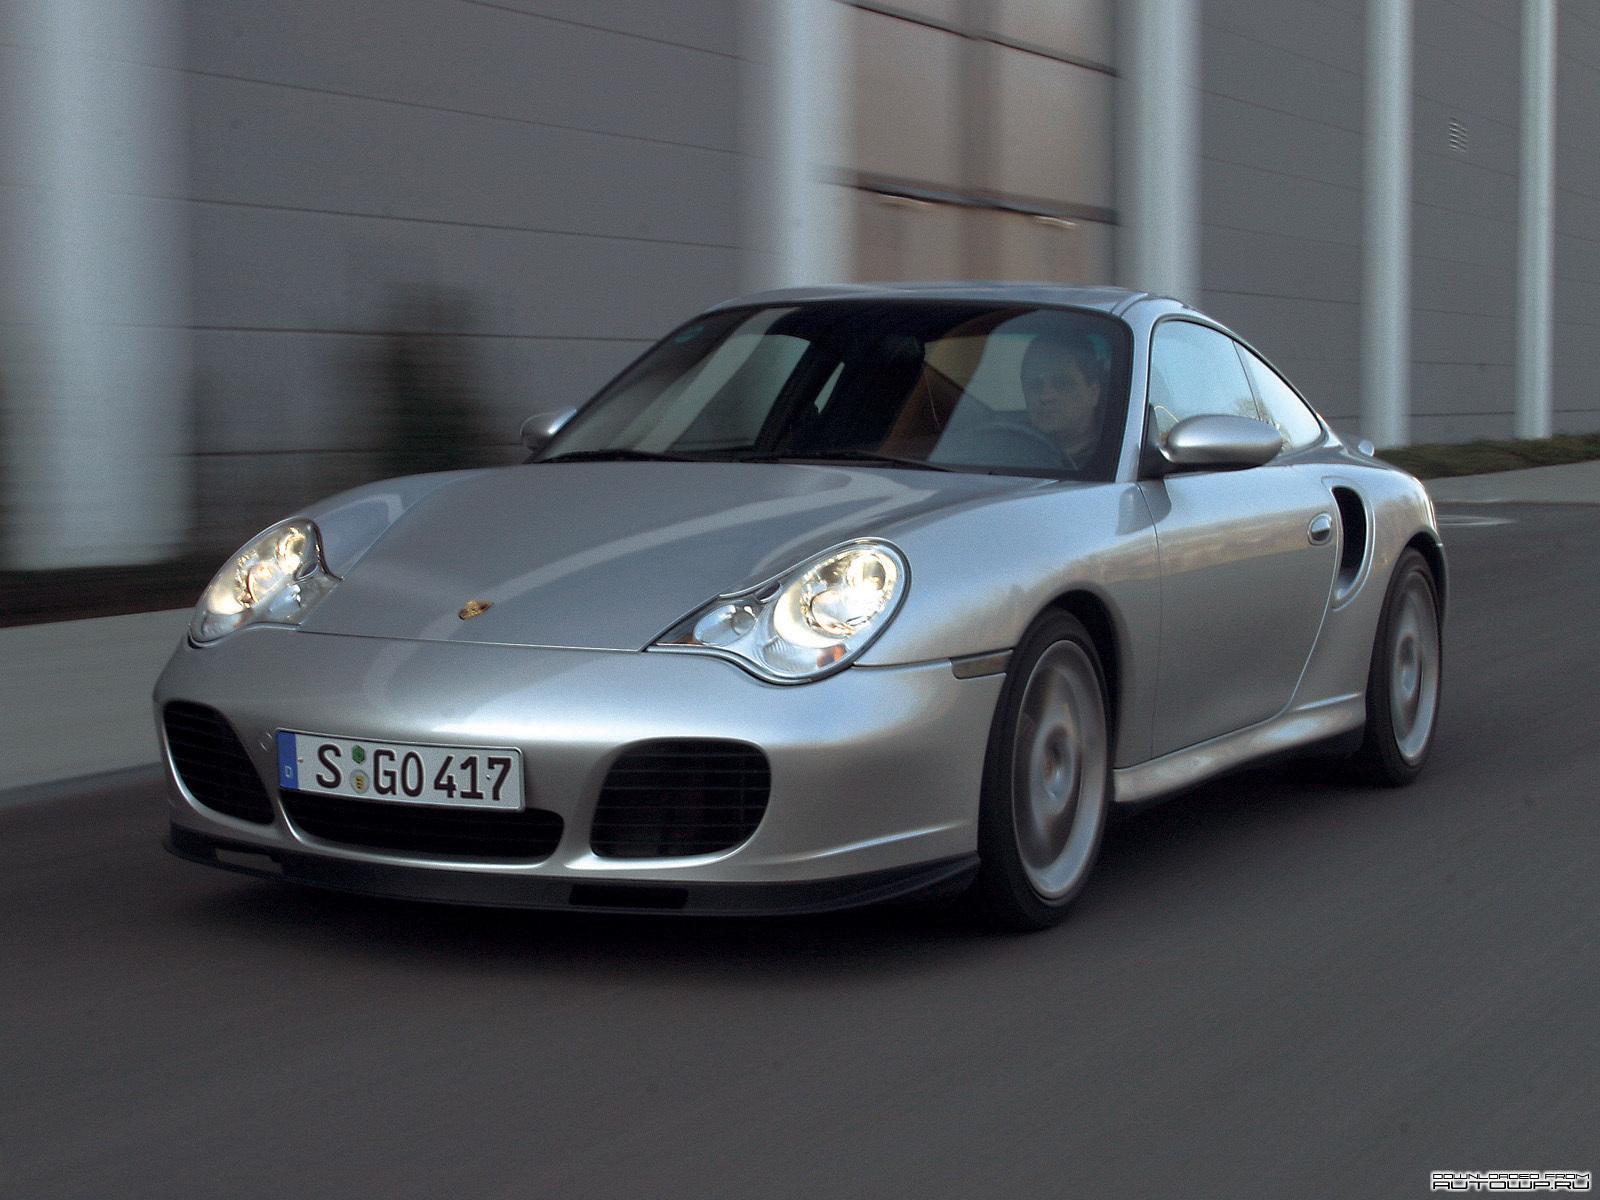 Porsche 911 Turbo 996 Photos Photogallery With 104